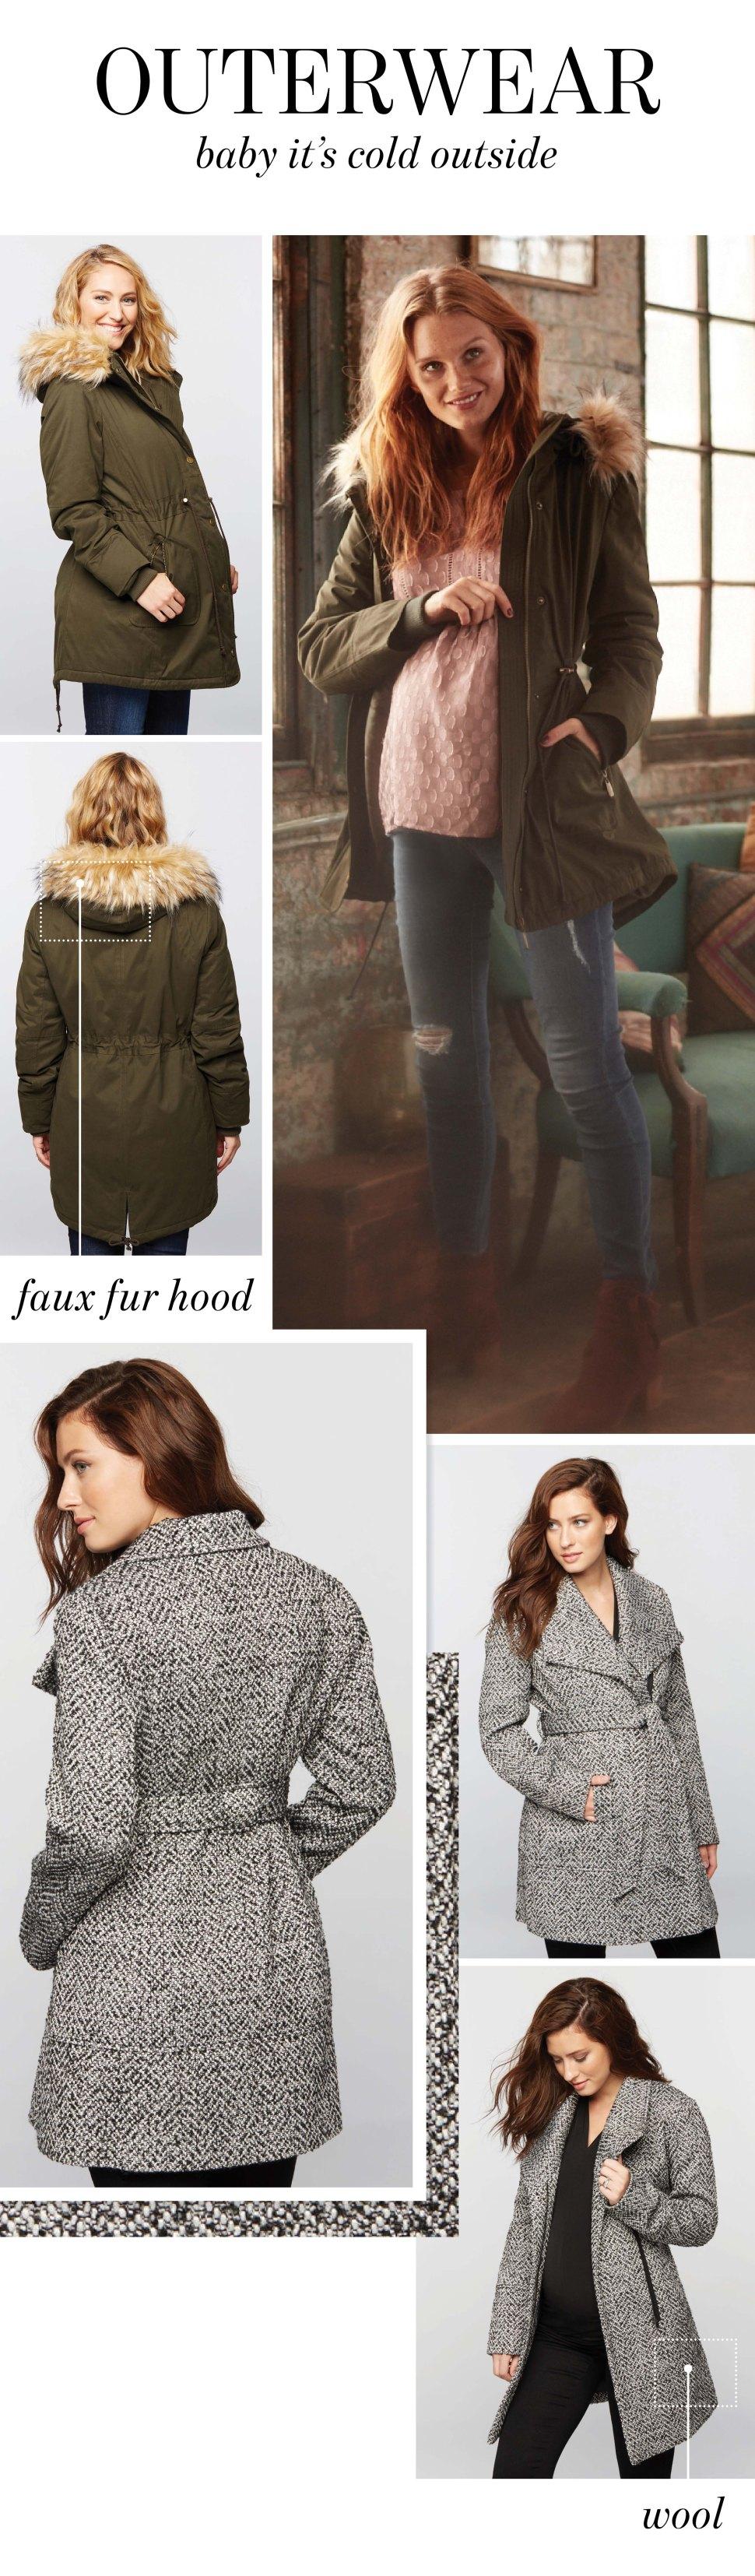 apip-blog-outerwear-post